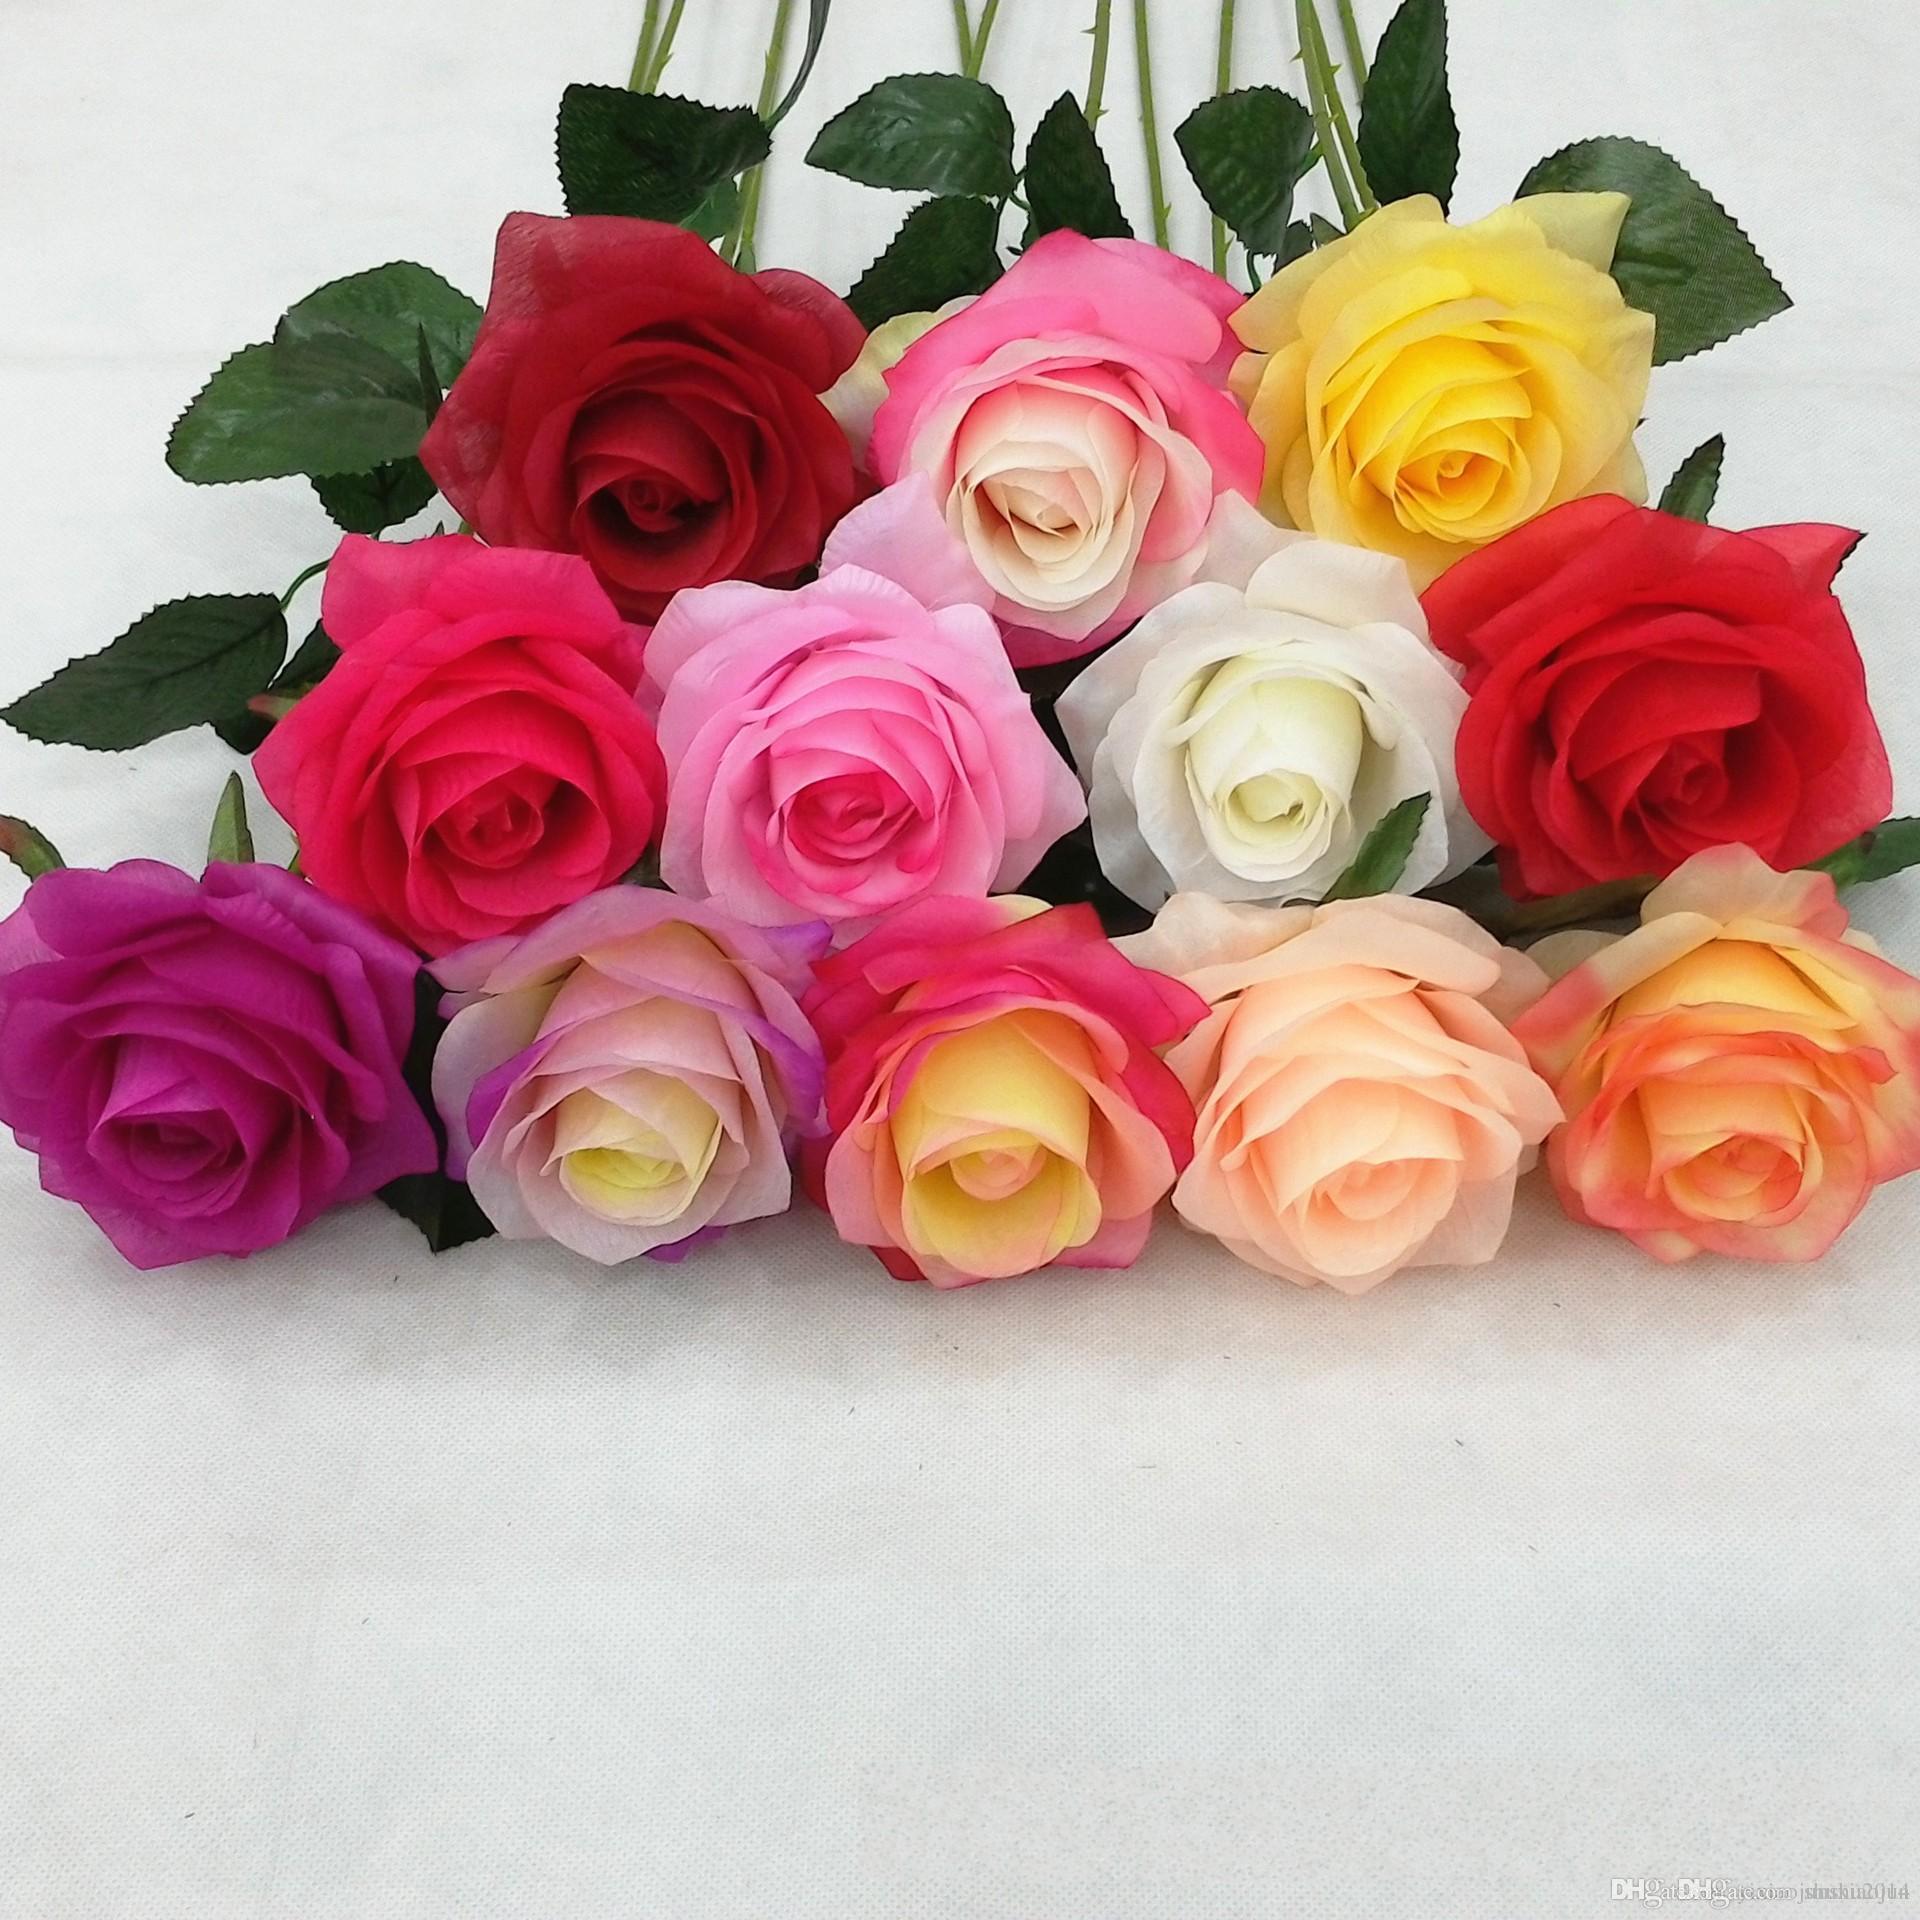 Buy Artificial Hydrangea Flower 65cm26 Fake Silk Single Hydrangeas